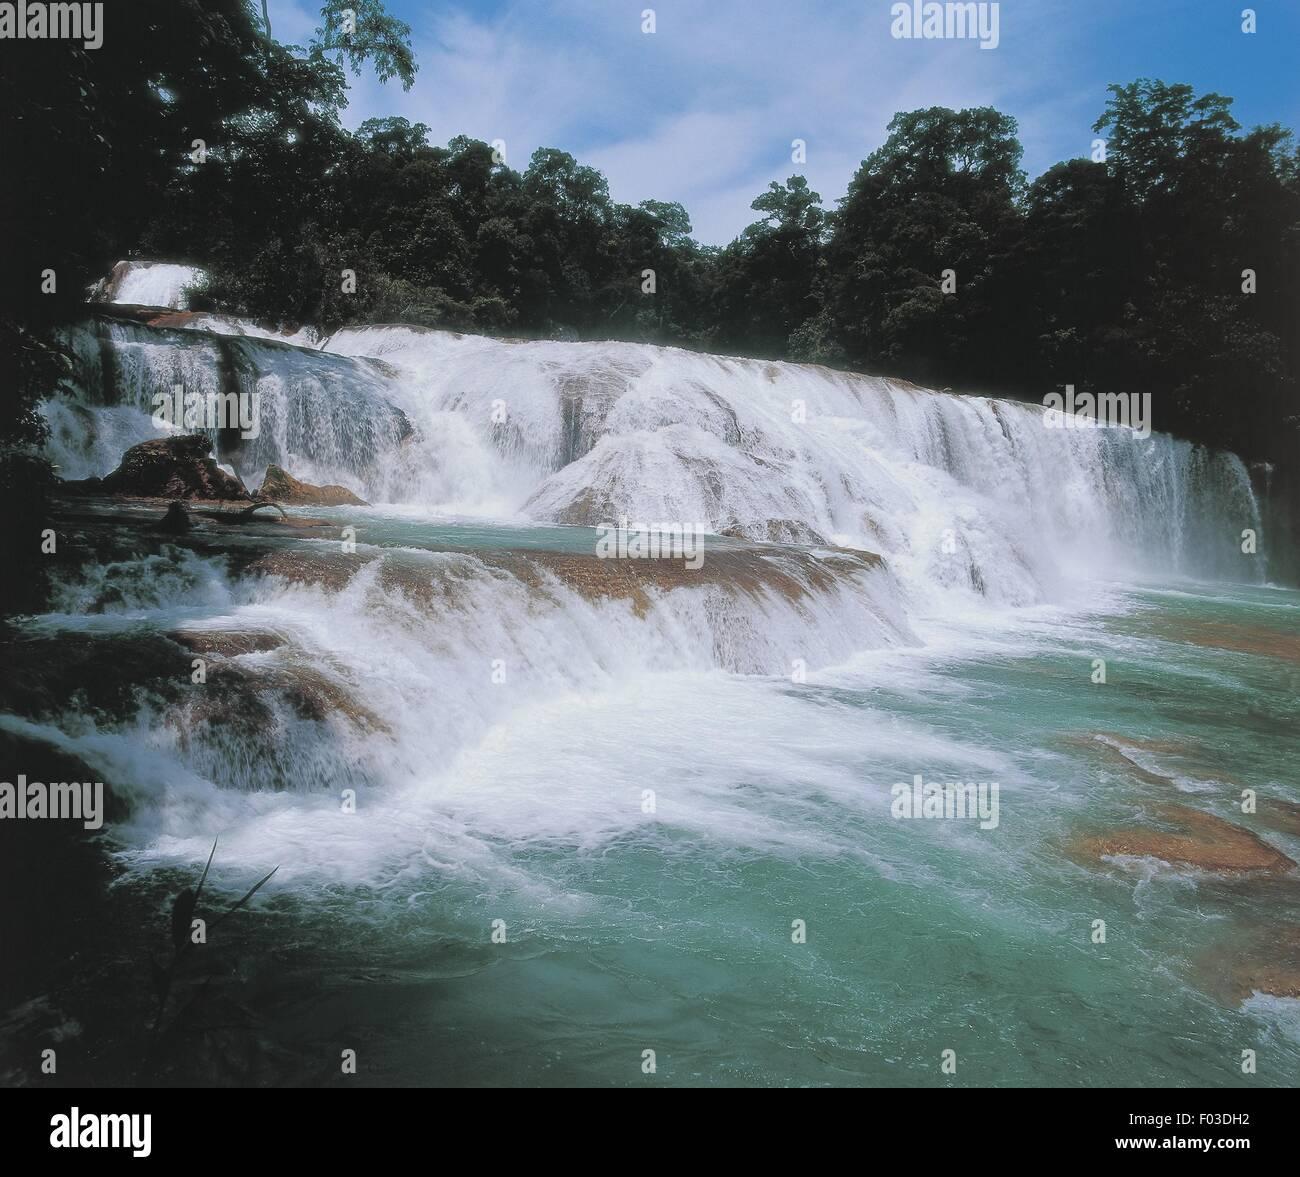 Mexico - Chiapas - Lacandon Rainforest - Agua Azul Falls of Tulija River - Stock Image